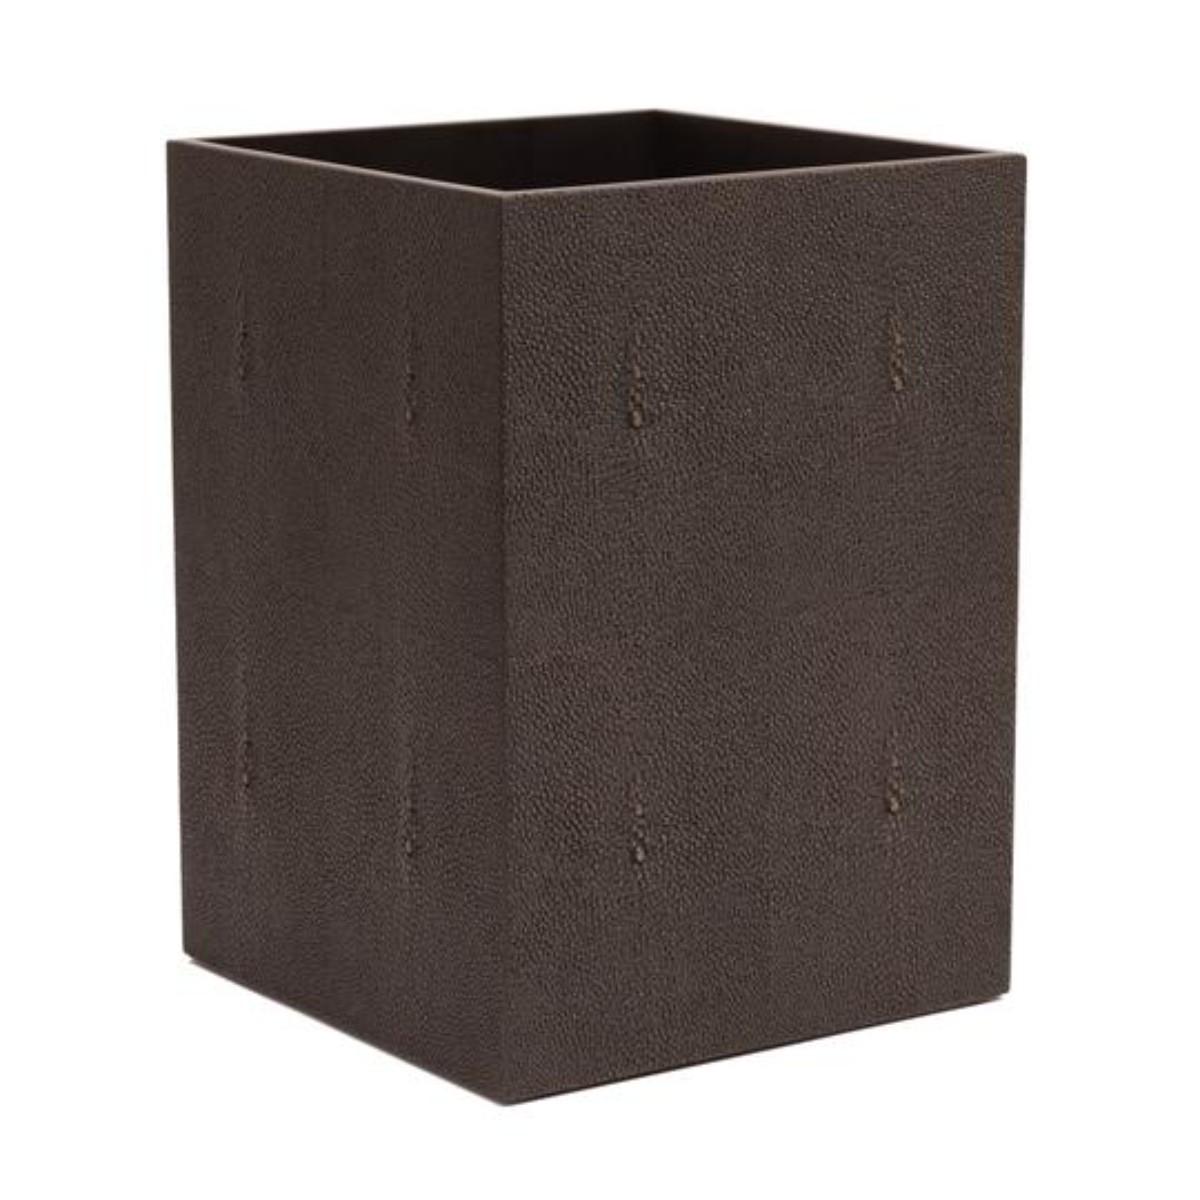 Posh Trading I Chelsea Waste Paper Basket | Chocolate Shagreen